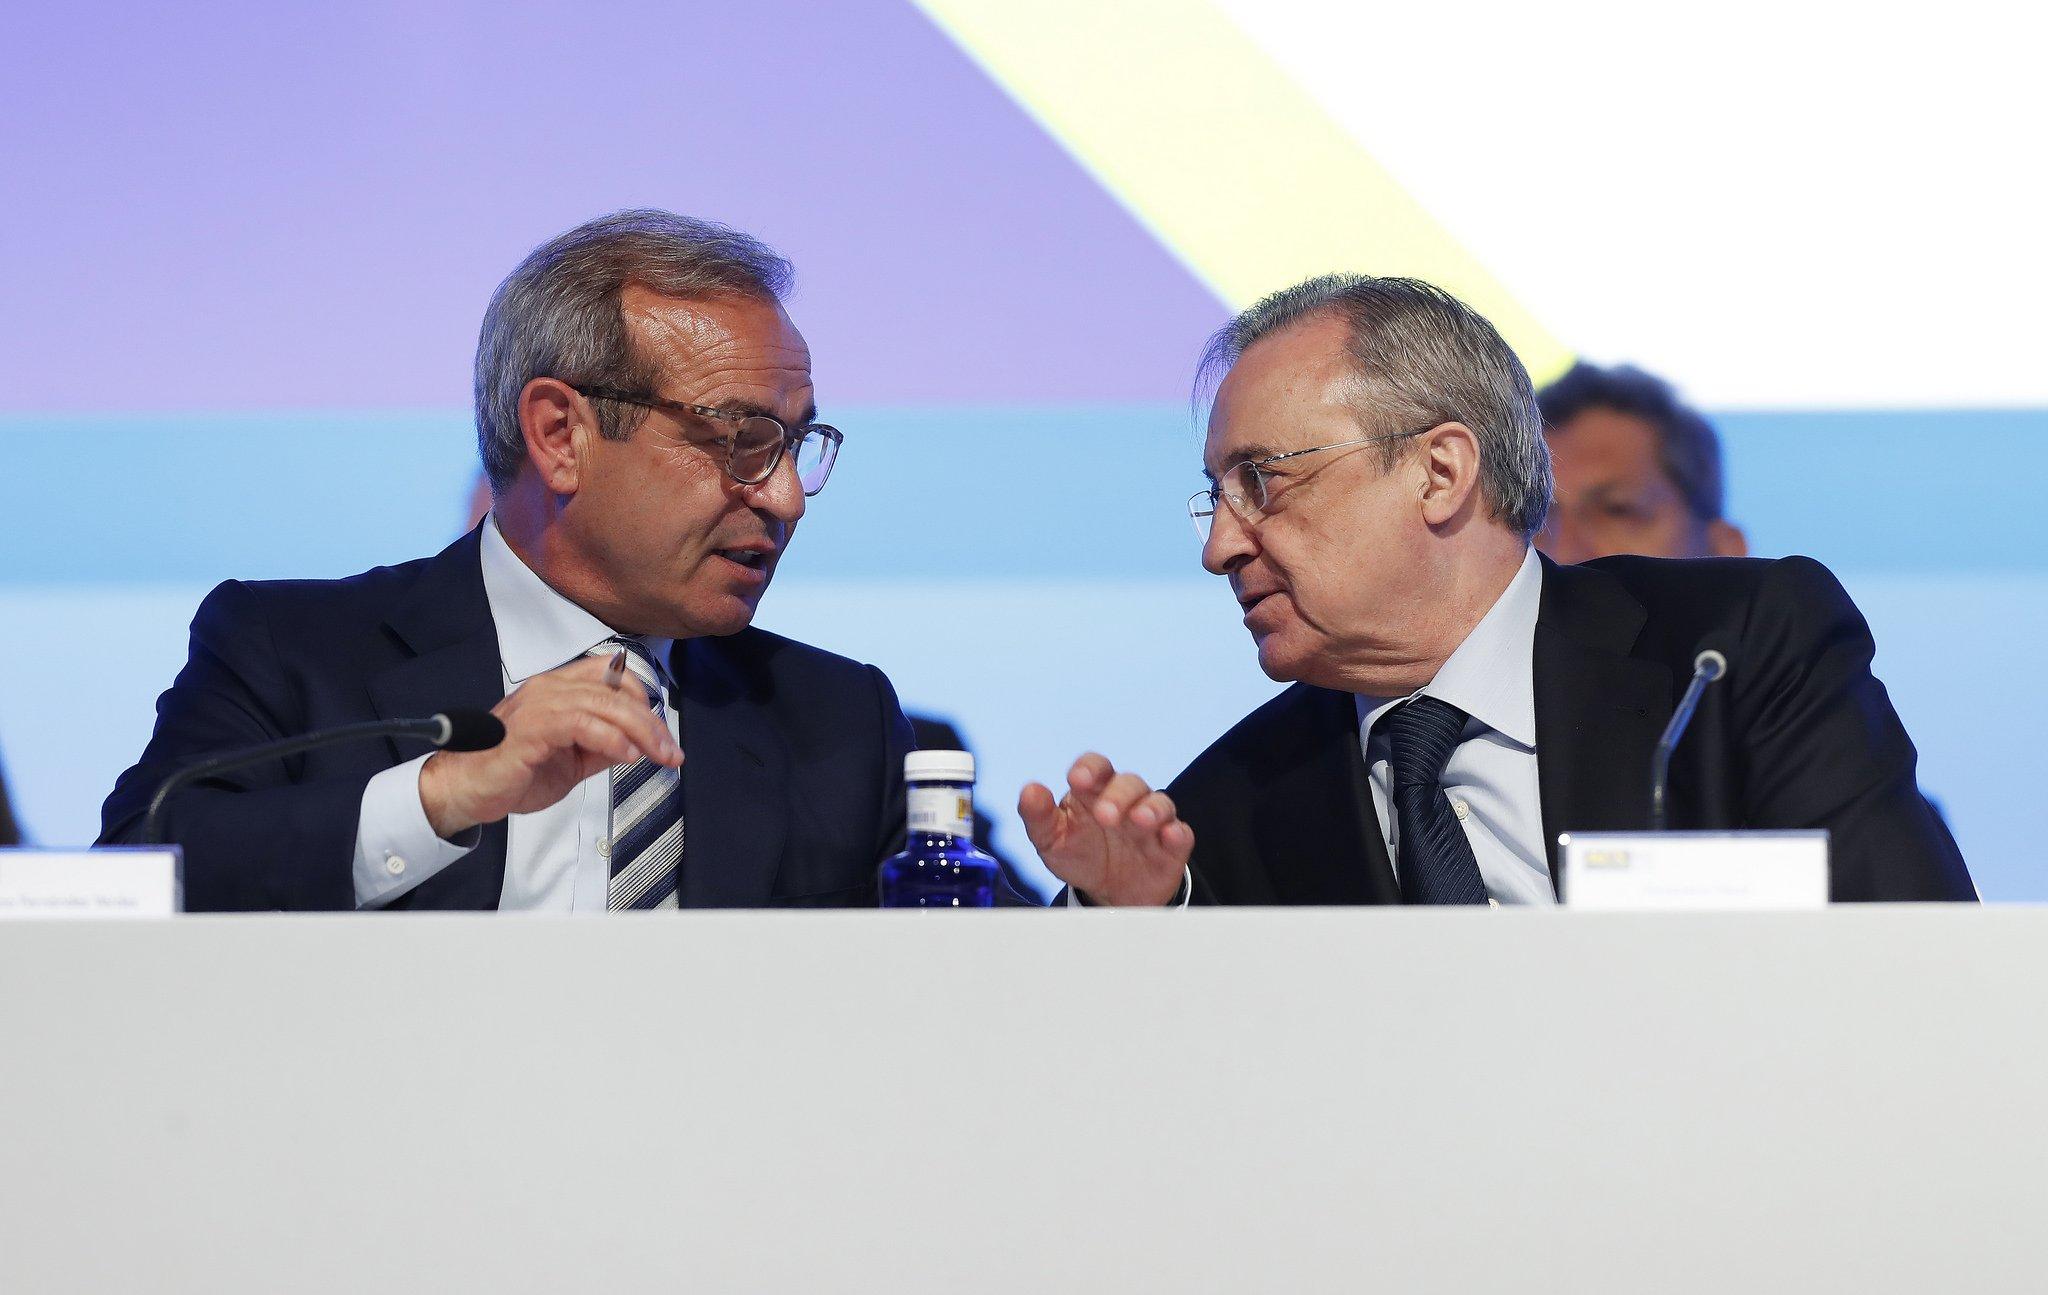 Marcelino Fernández Verdes, CEO del grupo ACS, y Florentino Pérez, presidente ejecutivo